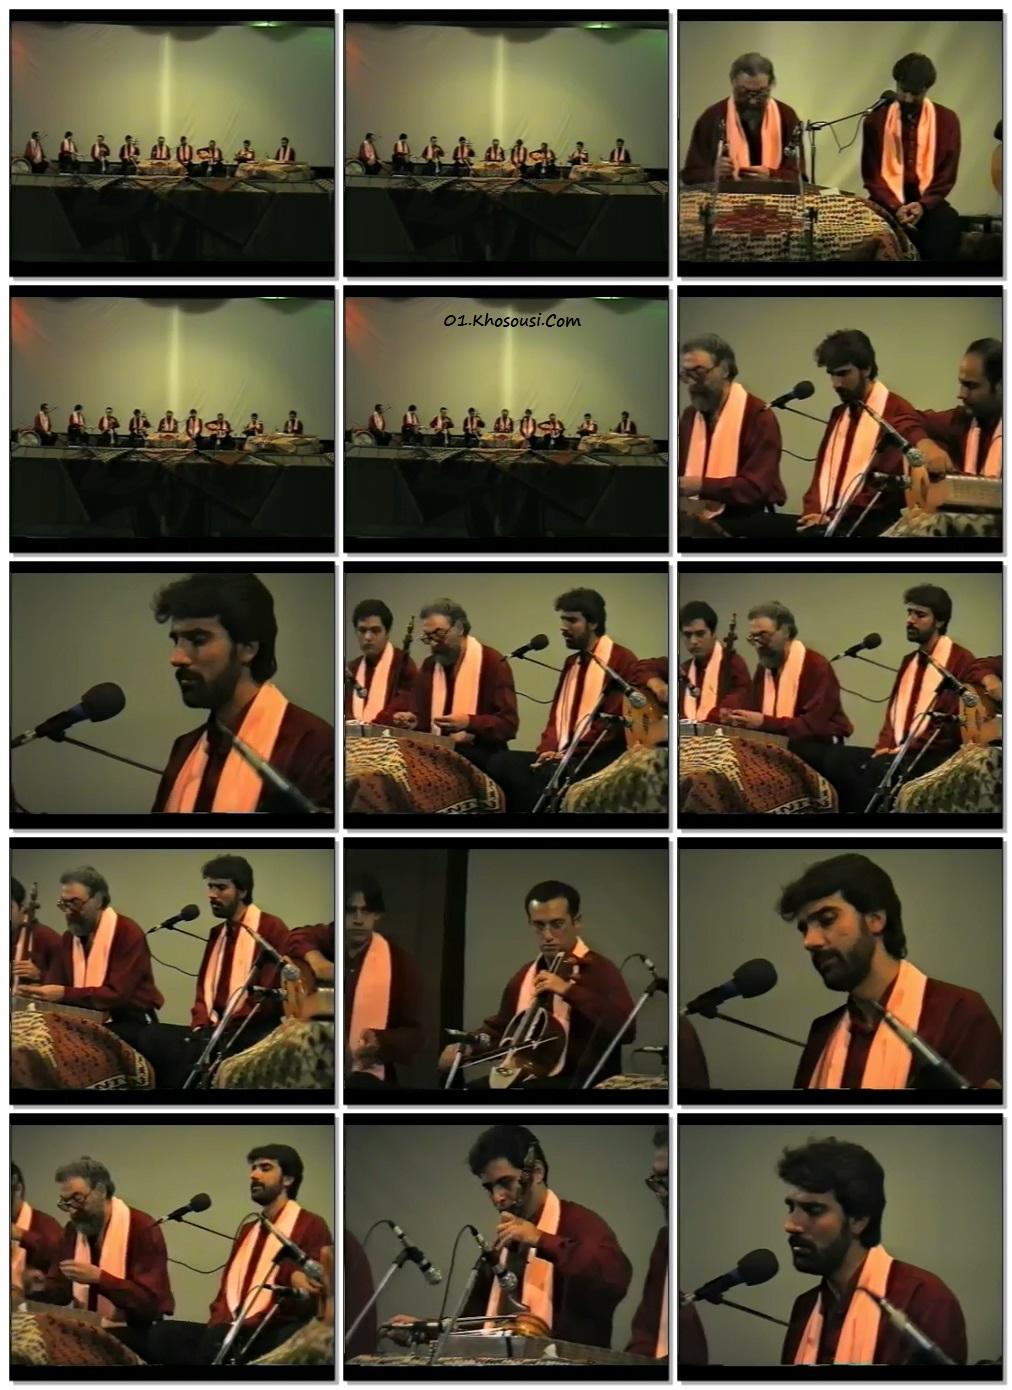 حمیدرضا نوربخش، پرویز مشکاتیان و گروه عارف - کنسرت تصویری سال ۷۸ کرمانشاه